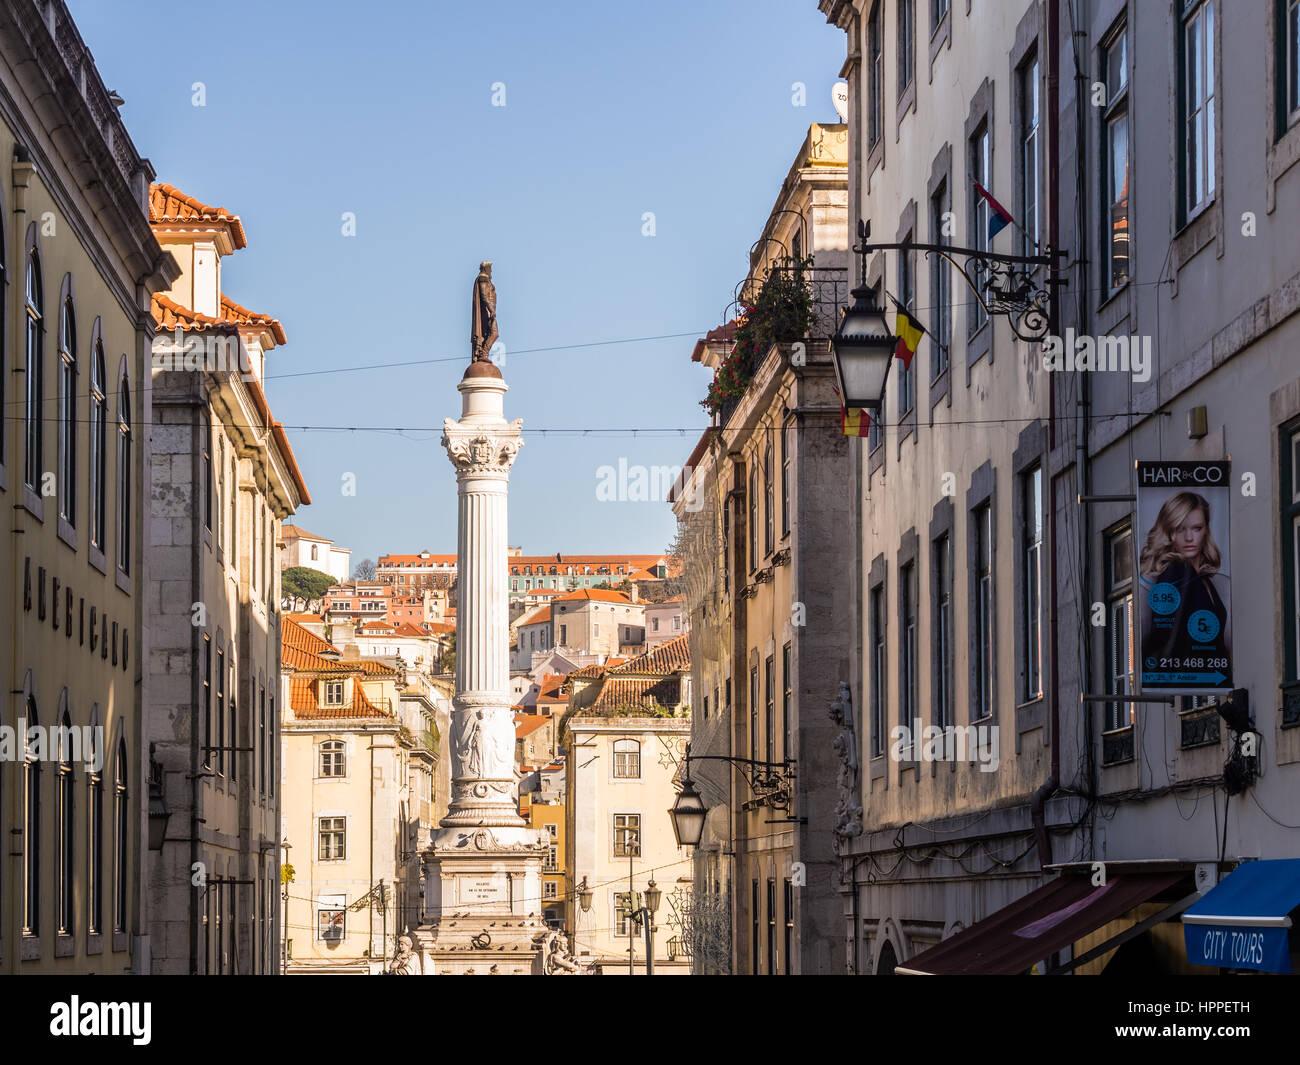 LISBON, PORTUGAL - JANUARY 10, 2017: Column of Pedro IV on Rossio Square (Pedro IV Square) in Lisbon, Portugal, Stock Photo